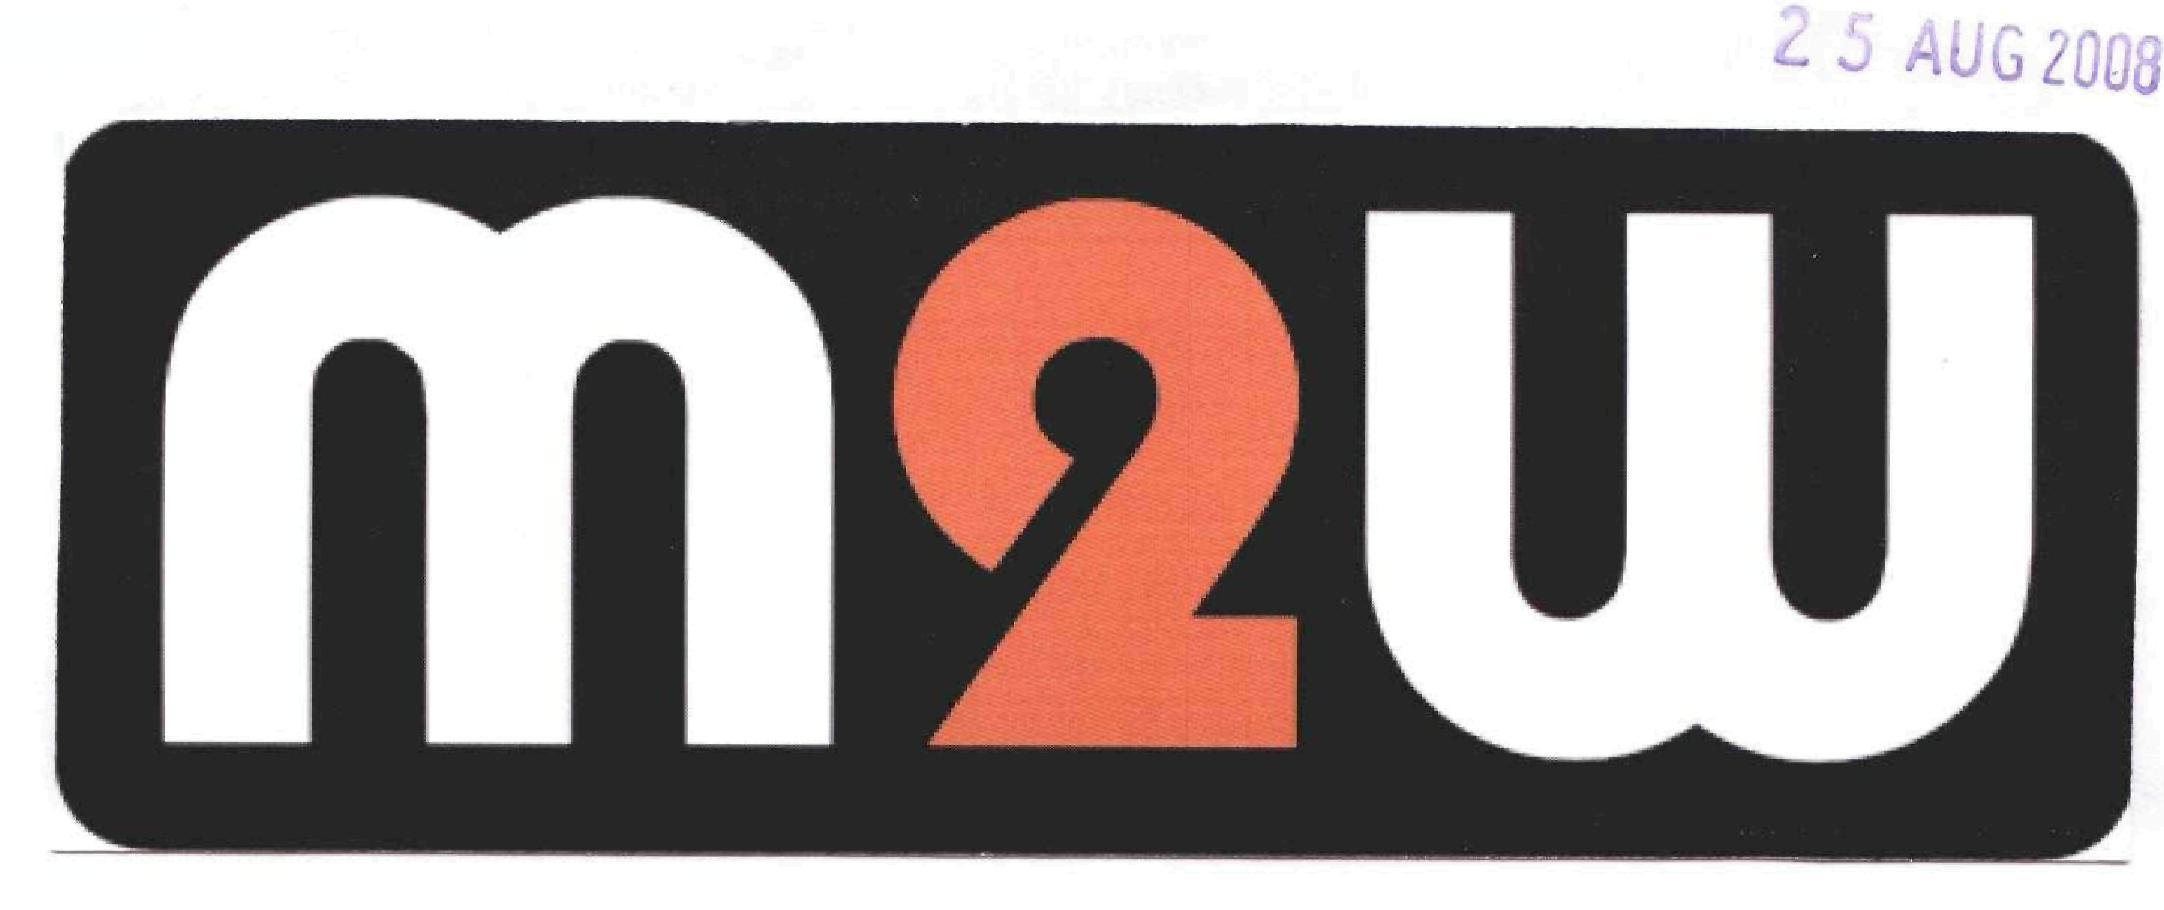 M 2 W Trademark Detail   Zauba Corp